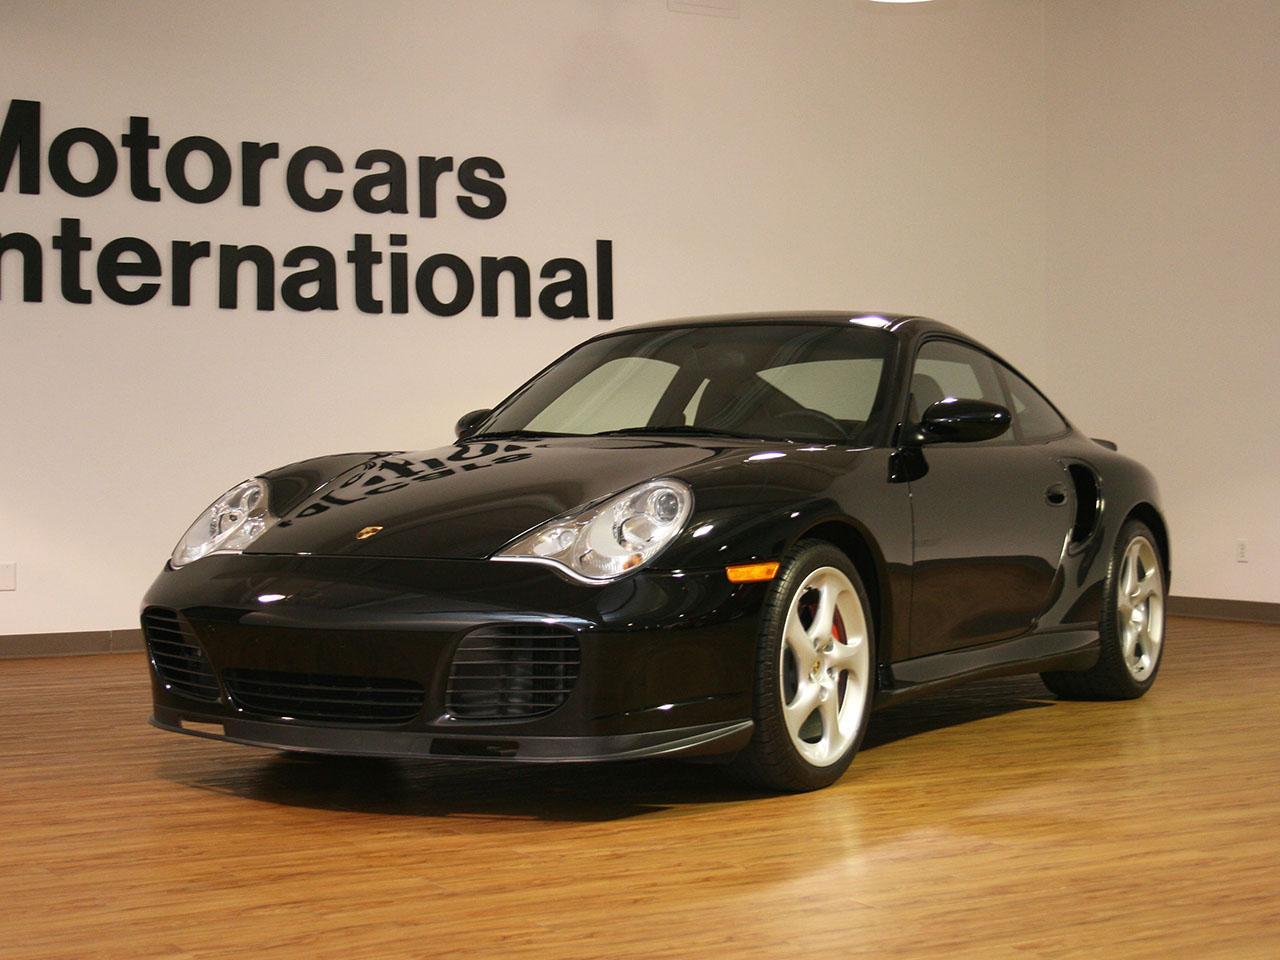 All Types 2003 911 : 2003 Porsche 911 Turbo X50